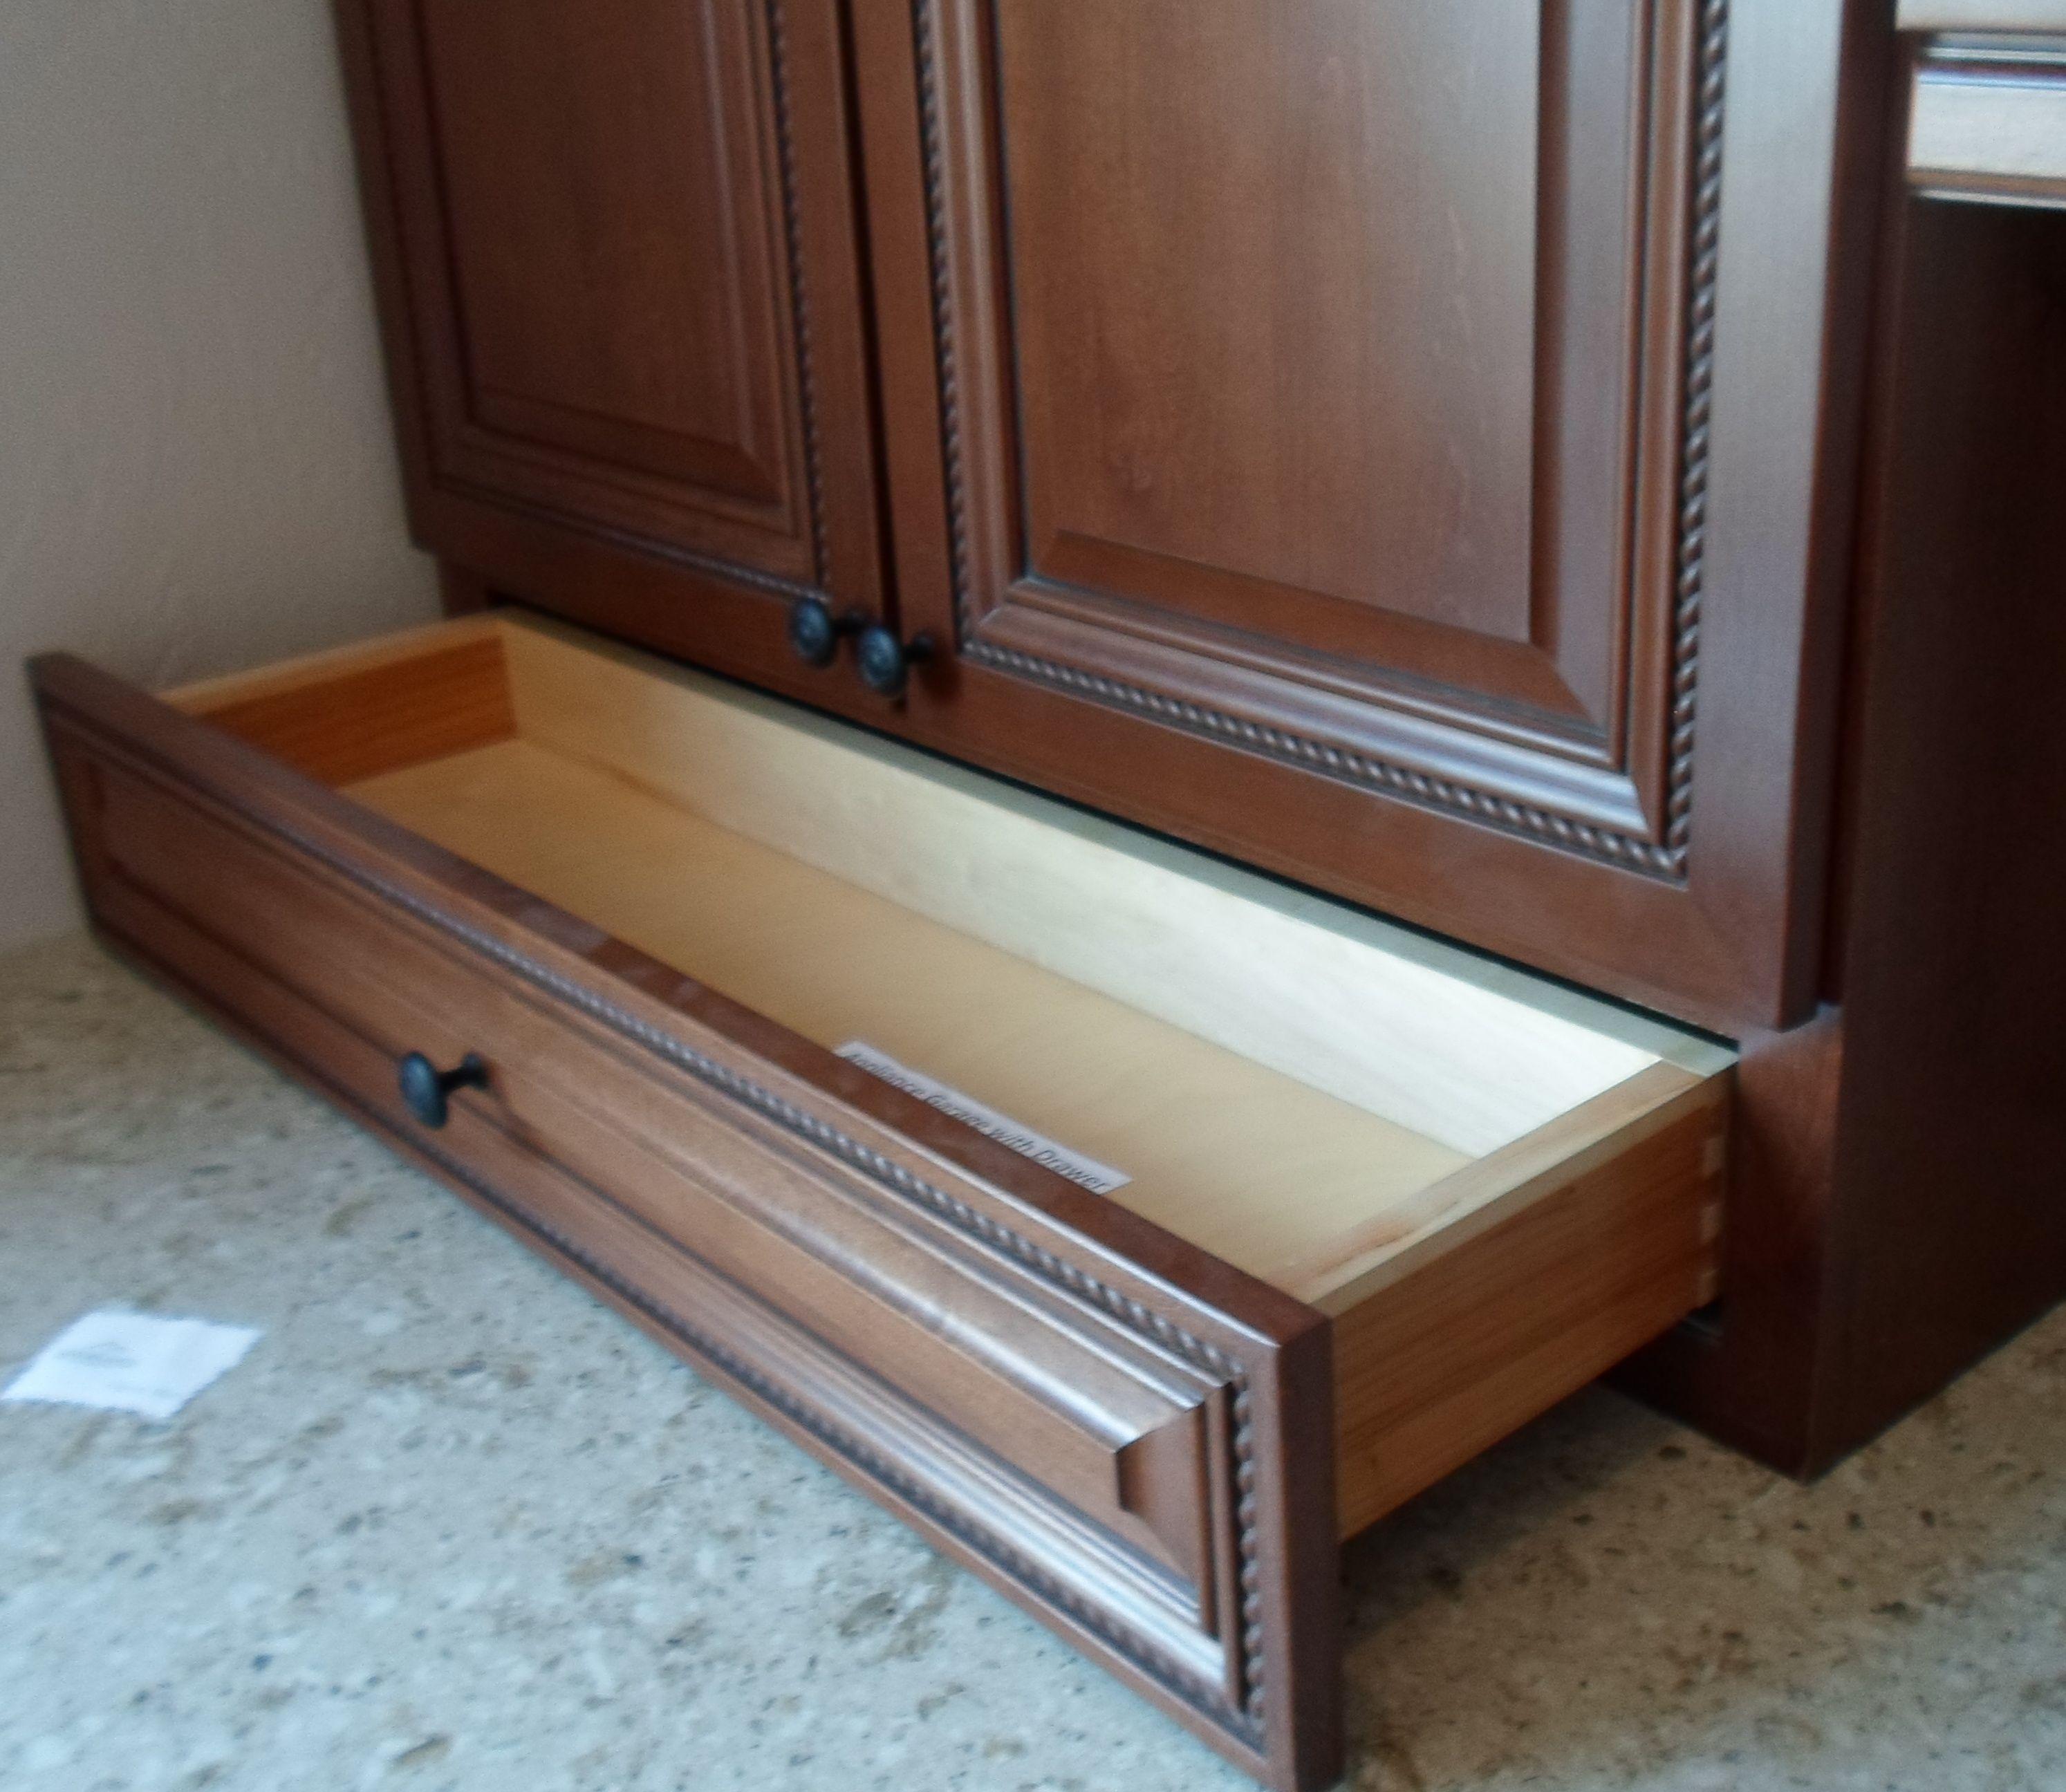 Karman Brand Alder Cabinets Stanton Door Style With Cognac Finish And Brown Glaze Alder Cabinets Cabinet Home Decor